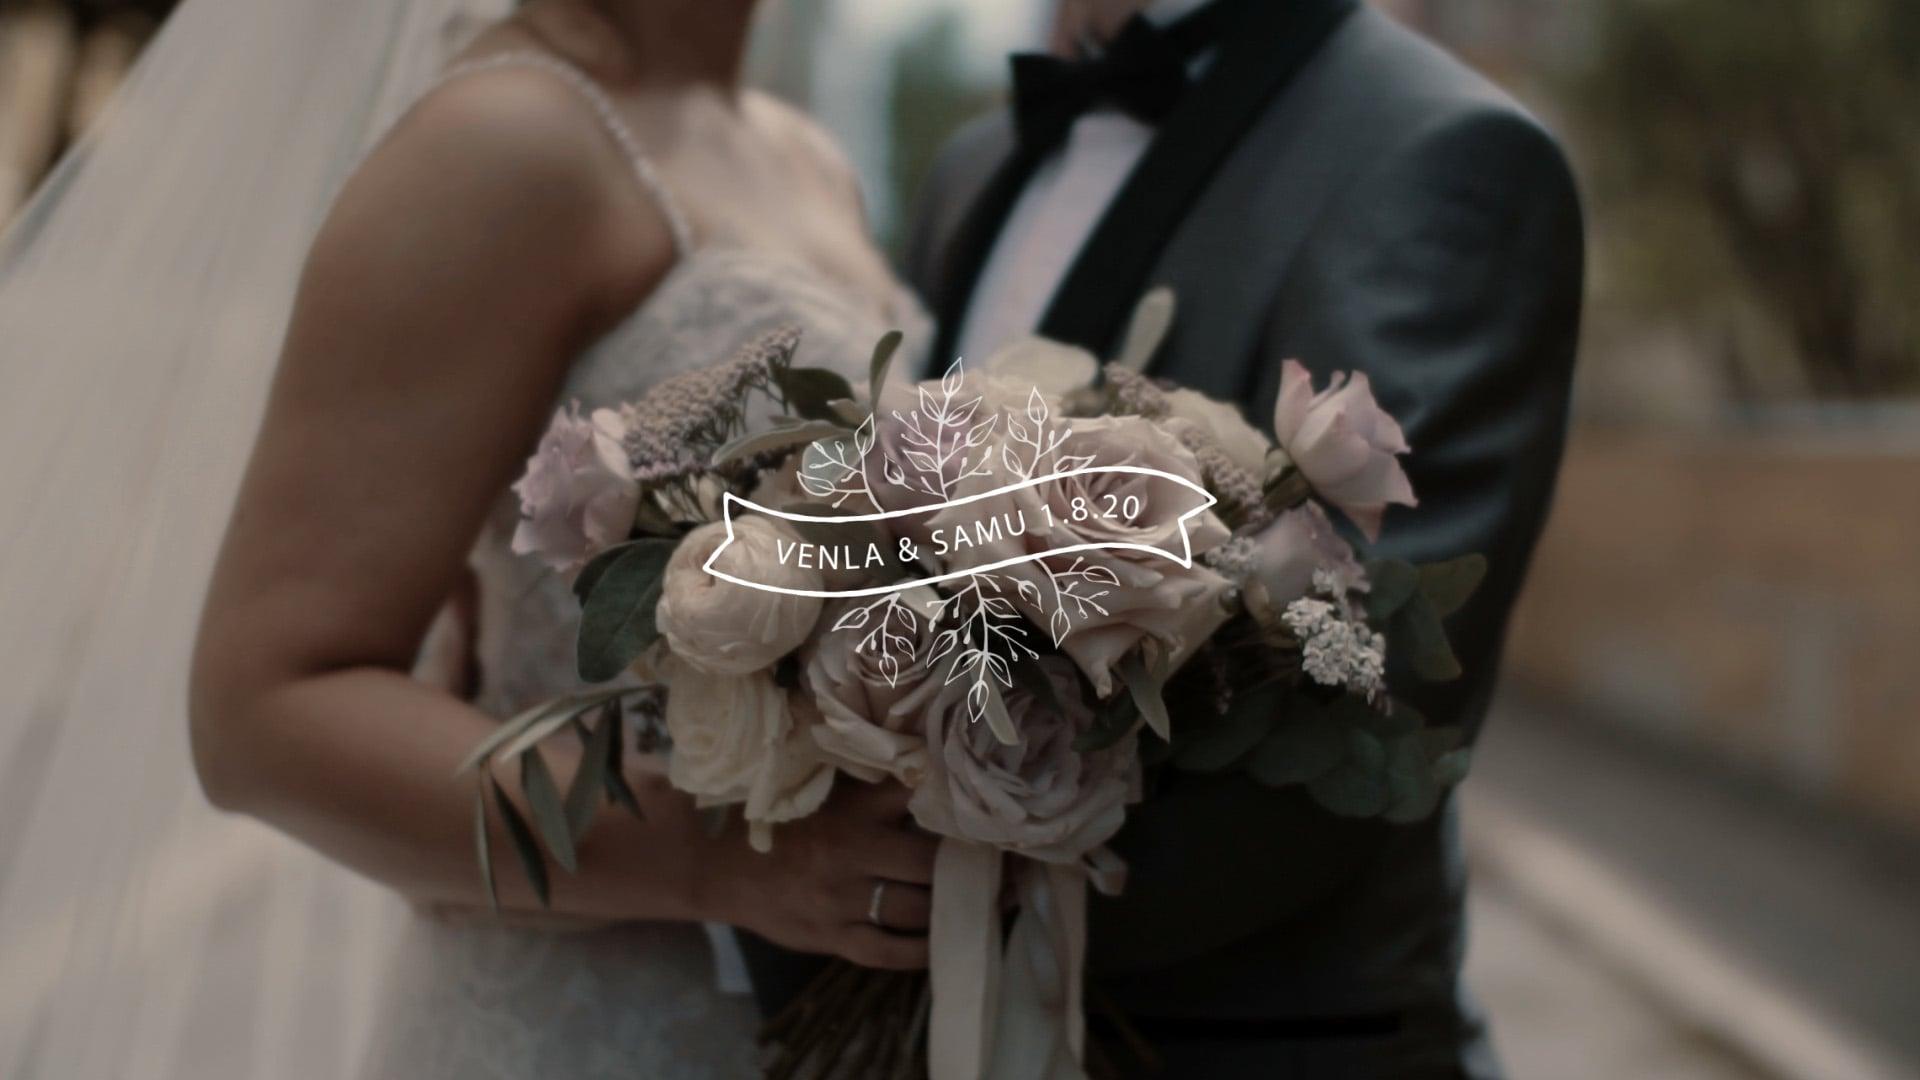 Venla & Samu 2020 Wedding Teaser